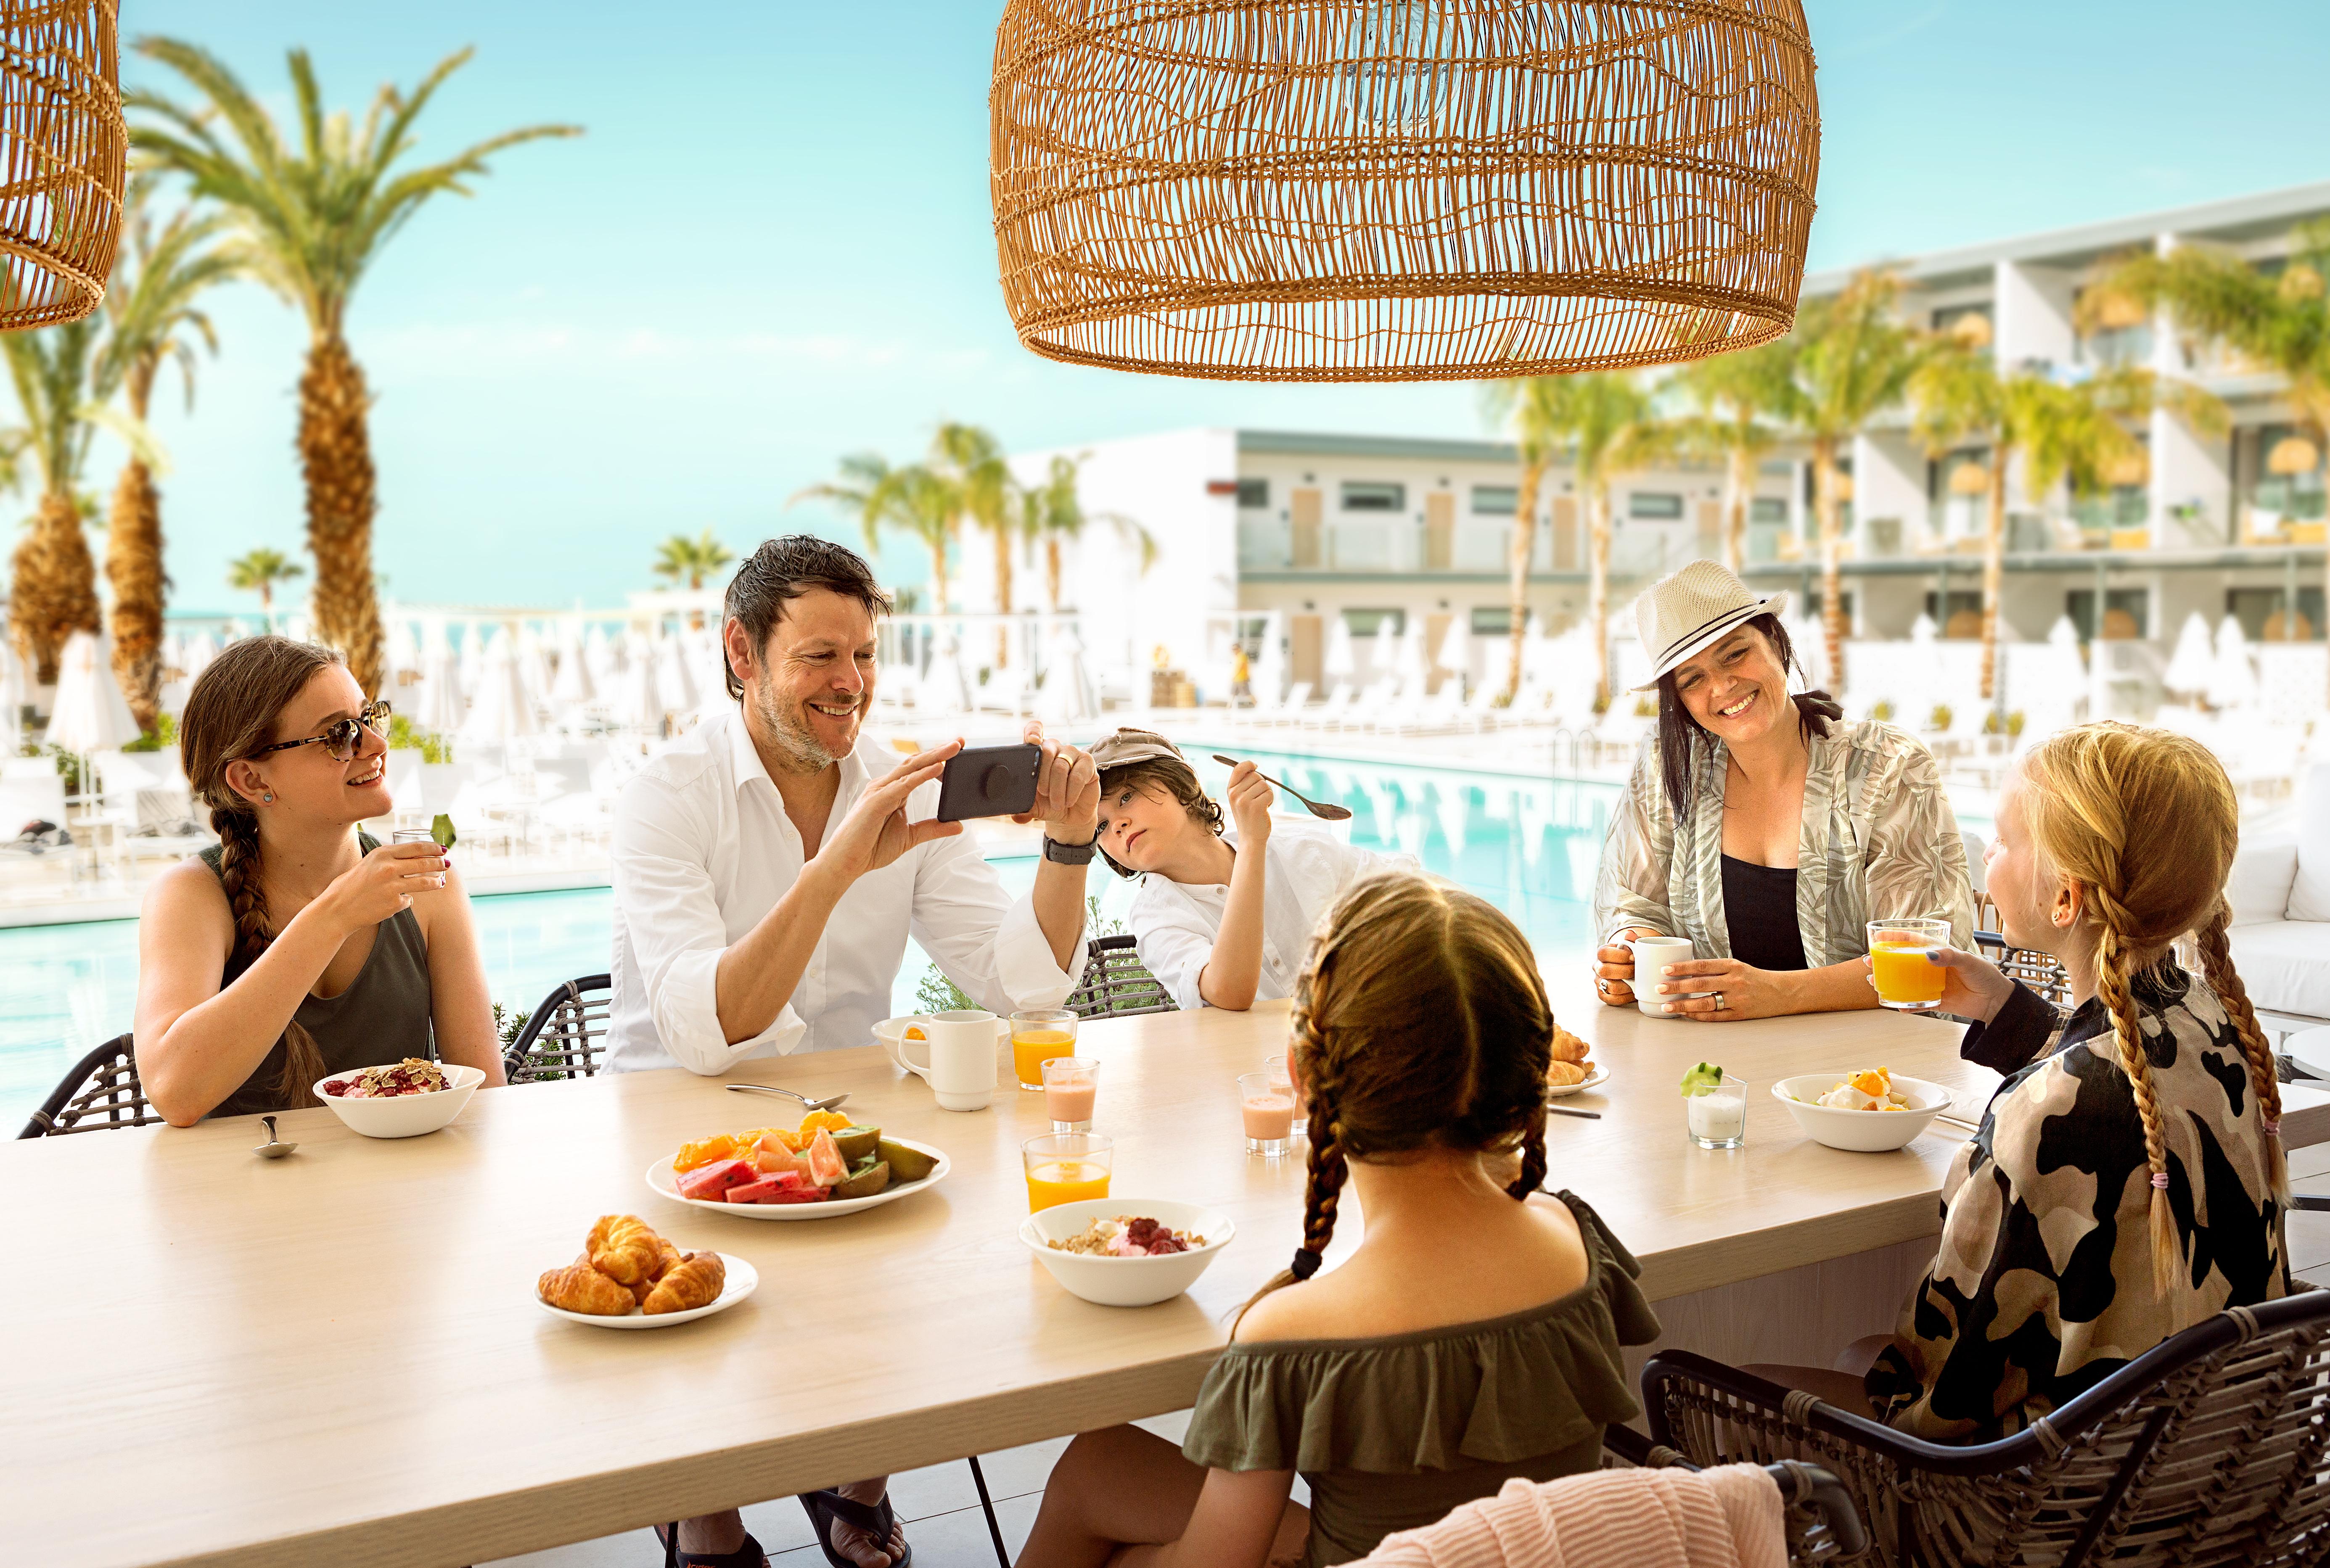 Cypern er sammen med Mallorca, Rhodos, Kreta og tyrkiske Antalya og Alanya de største rejsemål for Spies denne sommer. Pressefoto fra Spies.